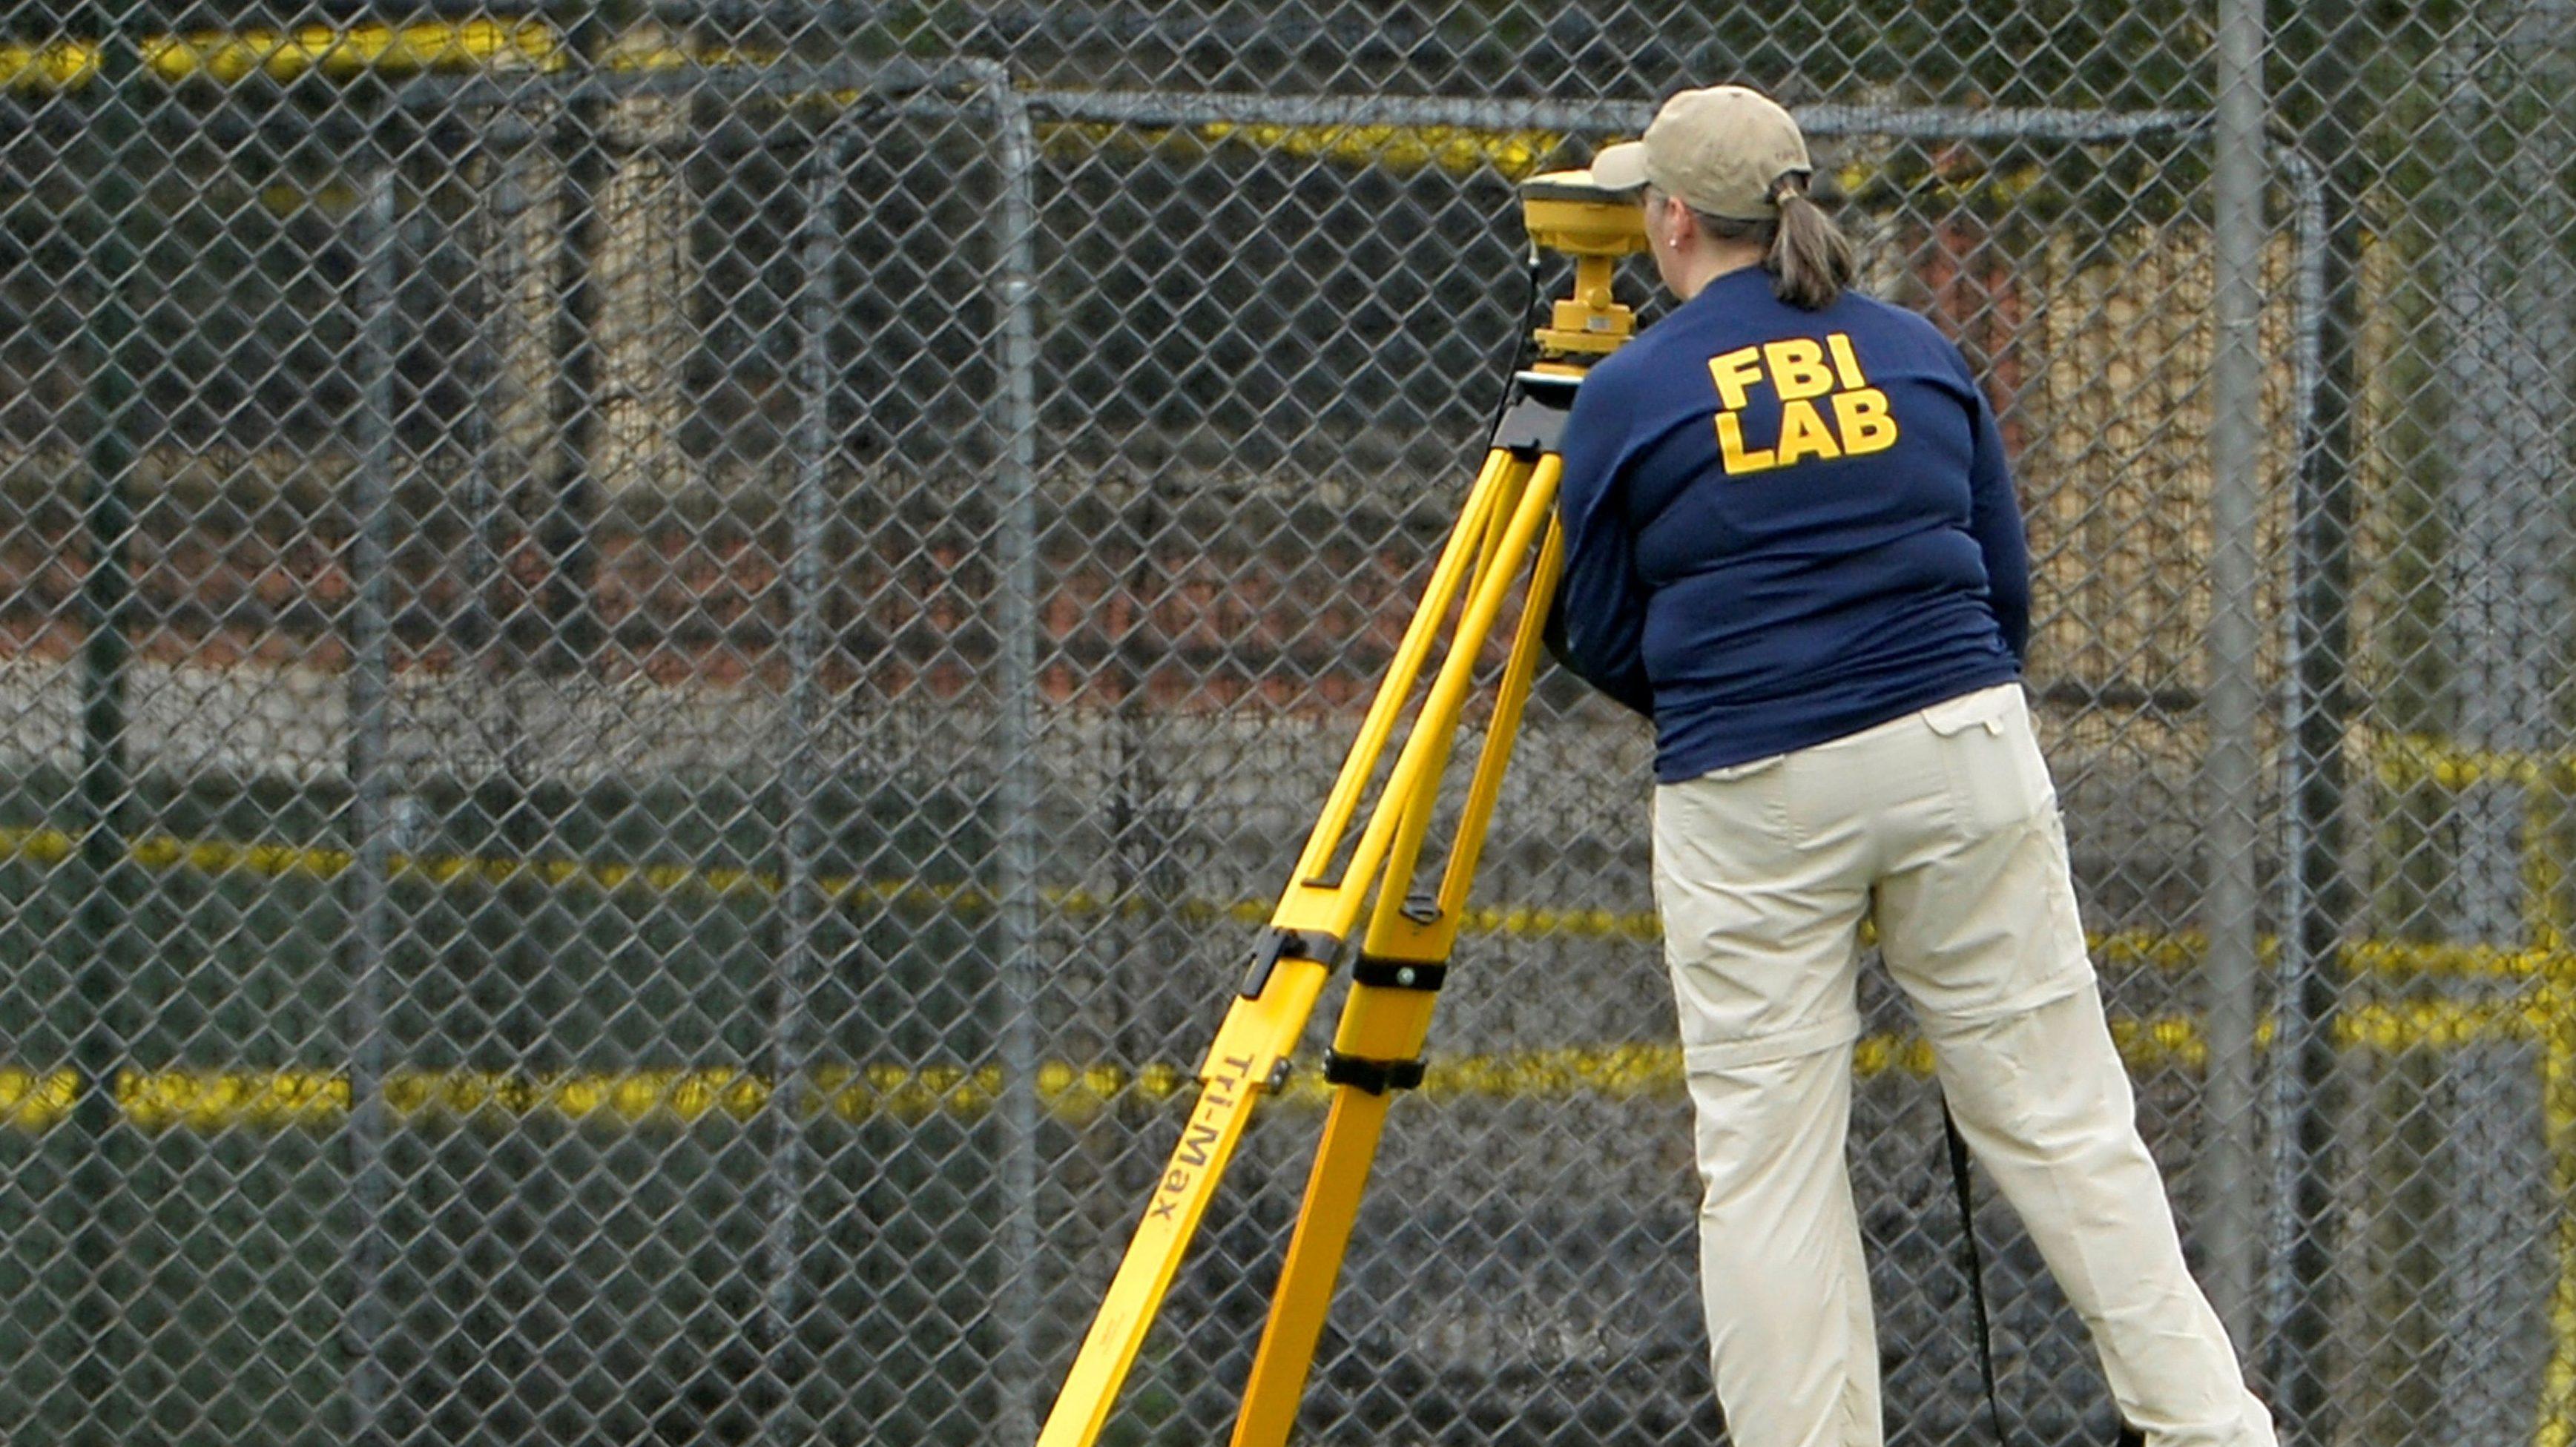 US Government shutdown 2019: The average FBI salary is $37,000 — Quartz